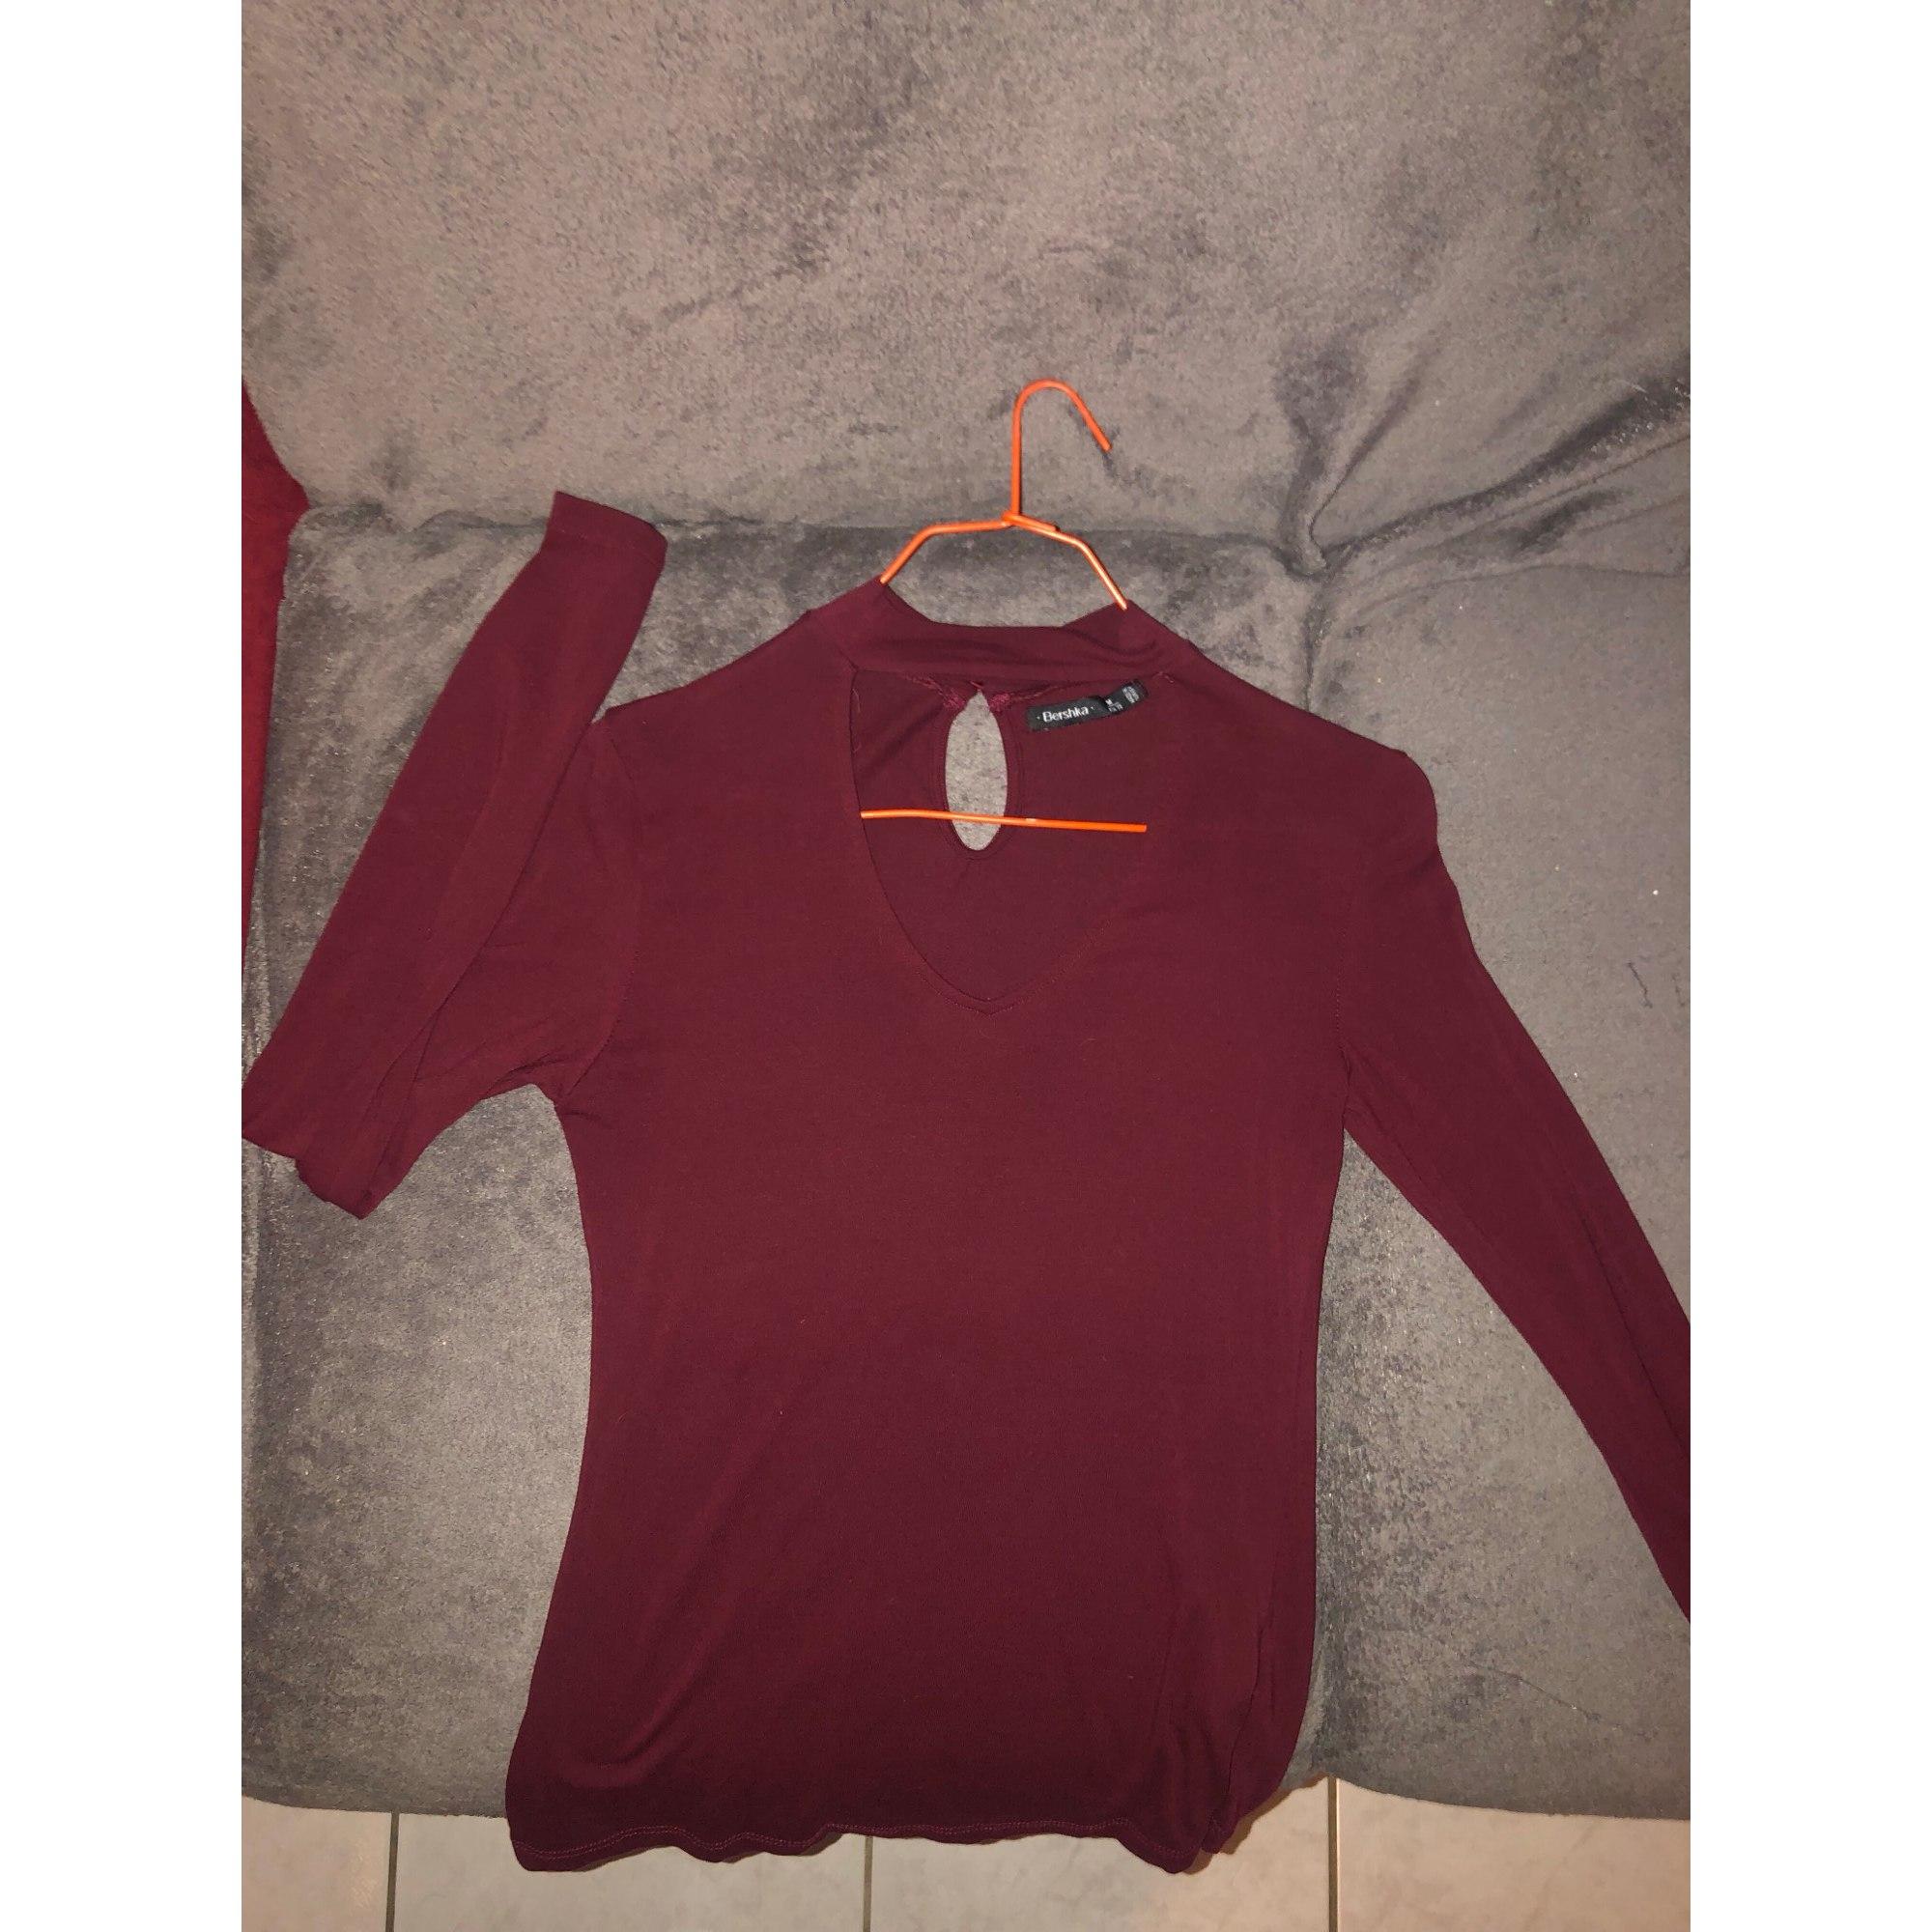 Top, tee-shirt BERSHKA Rouge, bordeaux